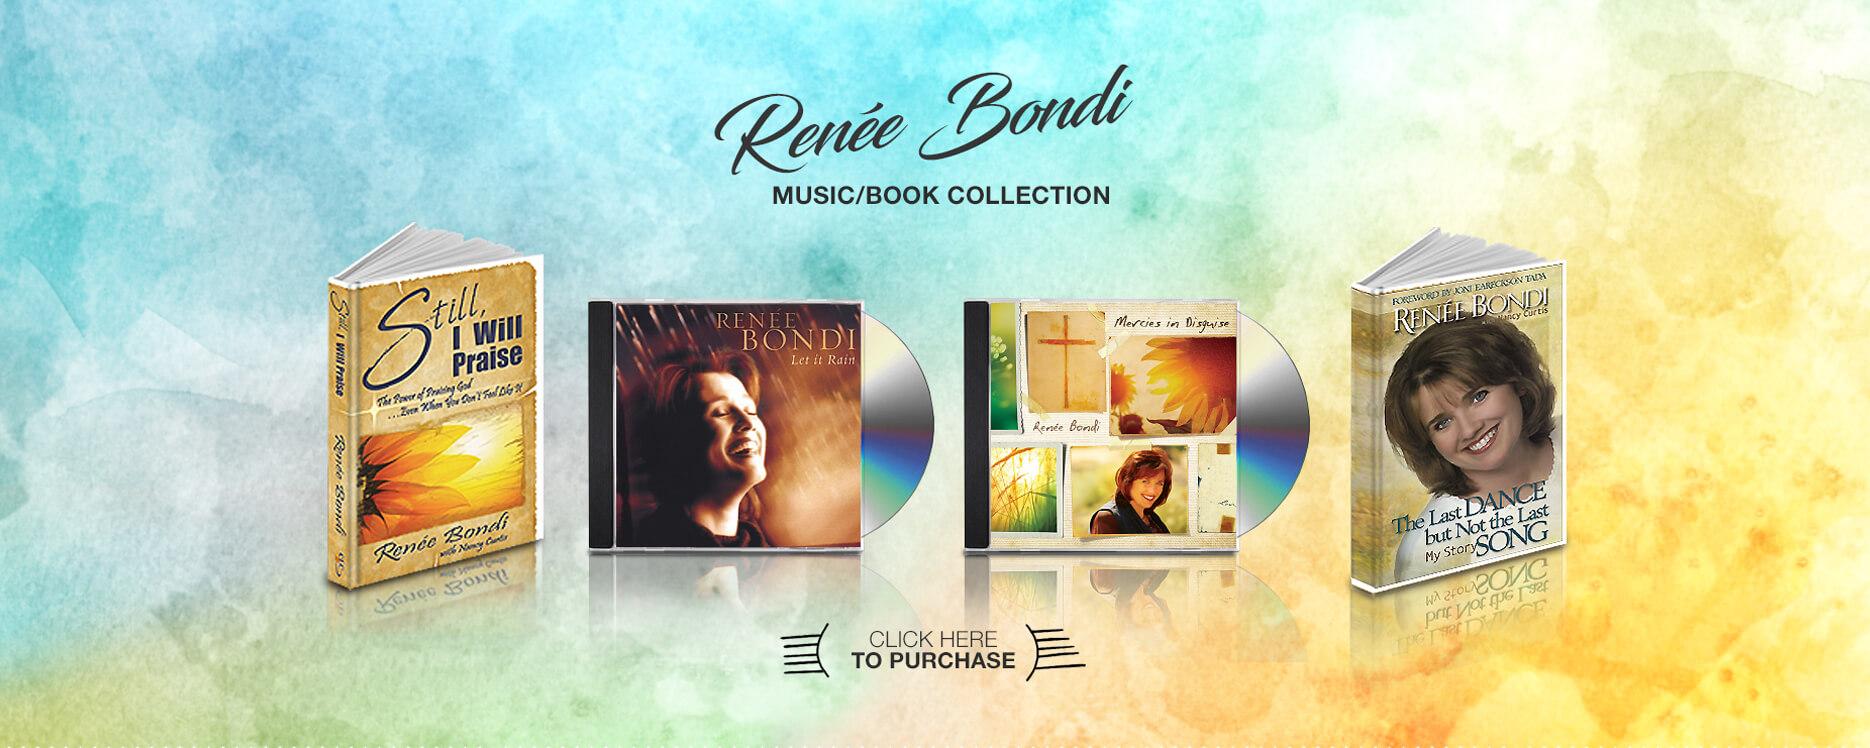 Renee Bondi's Music Collection